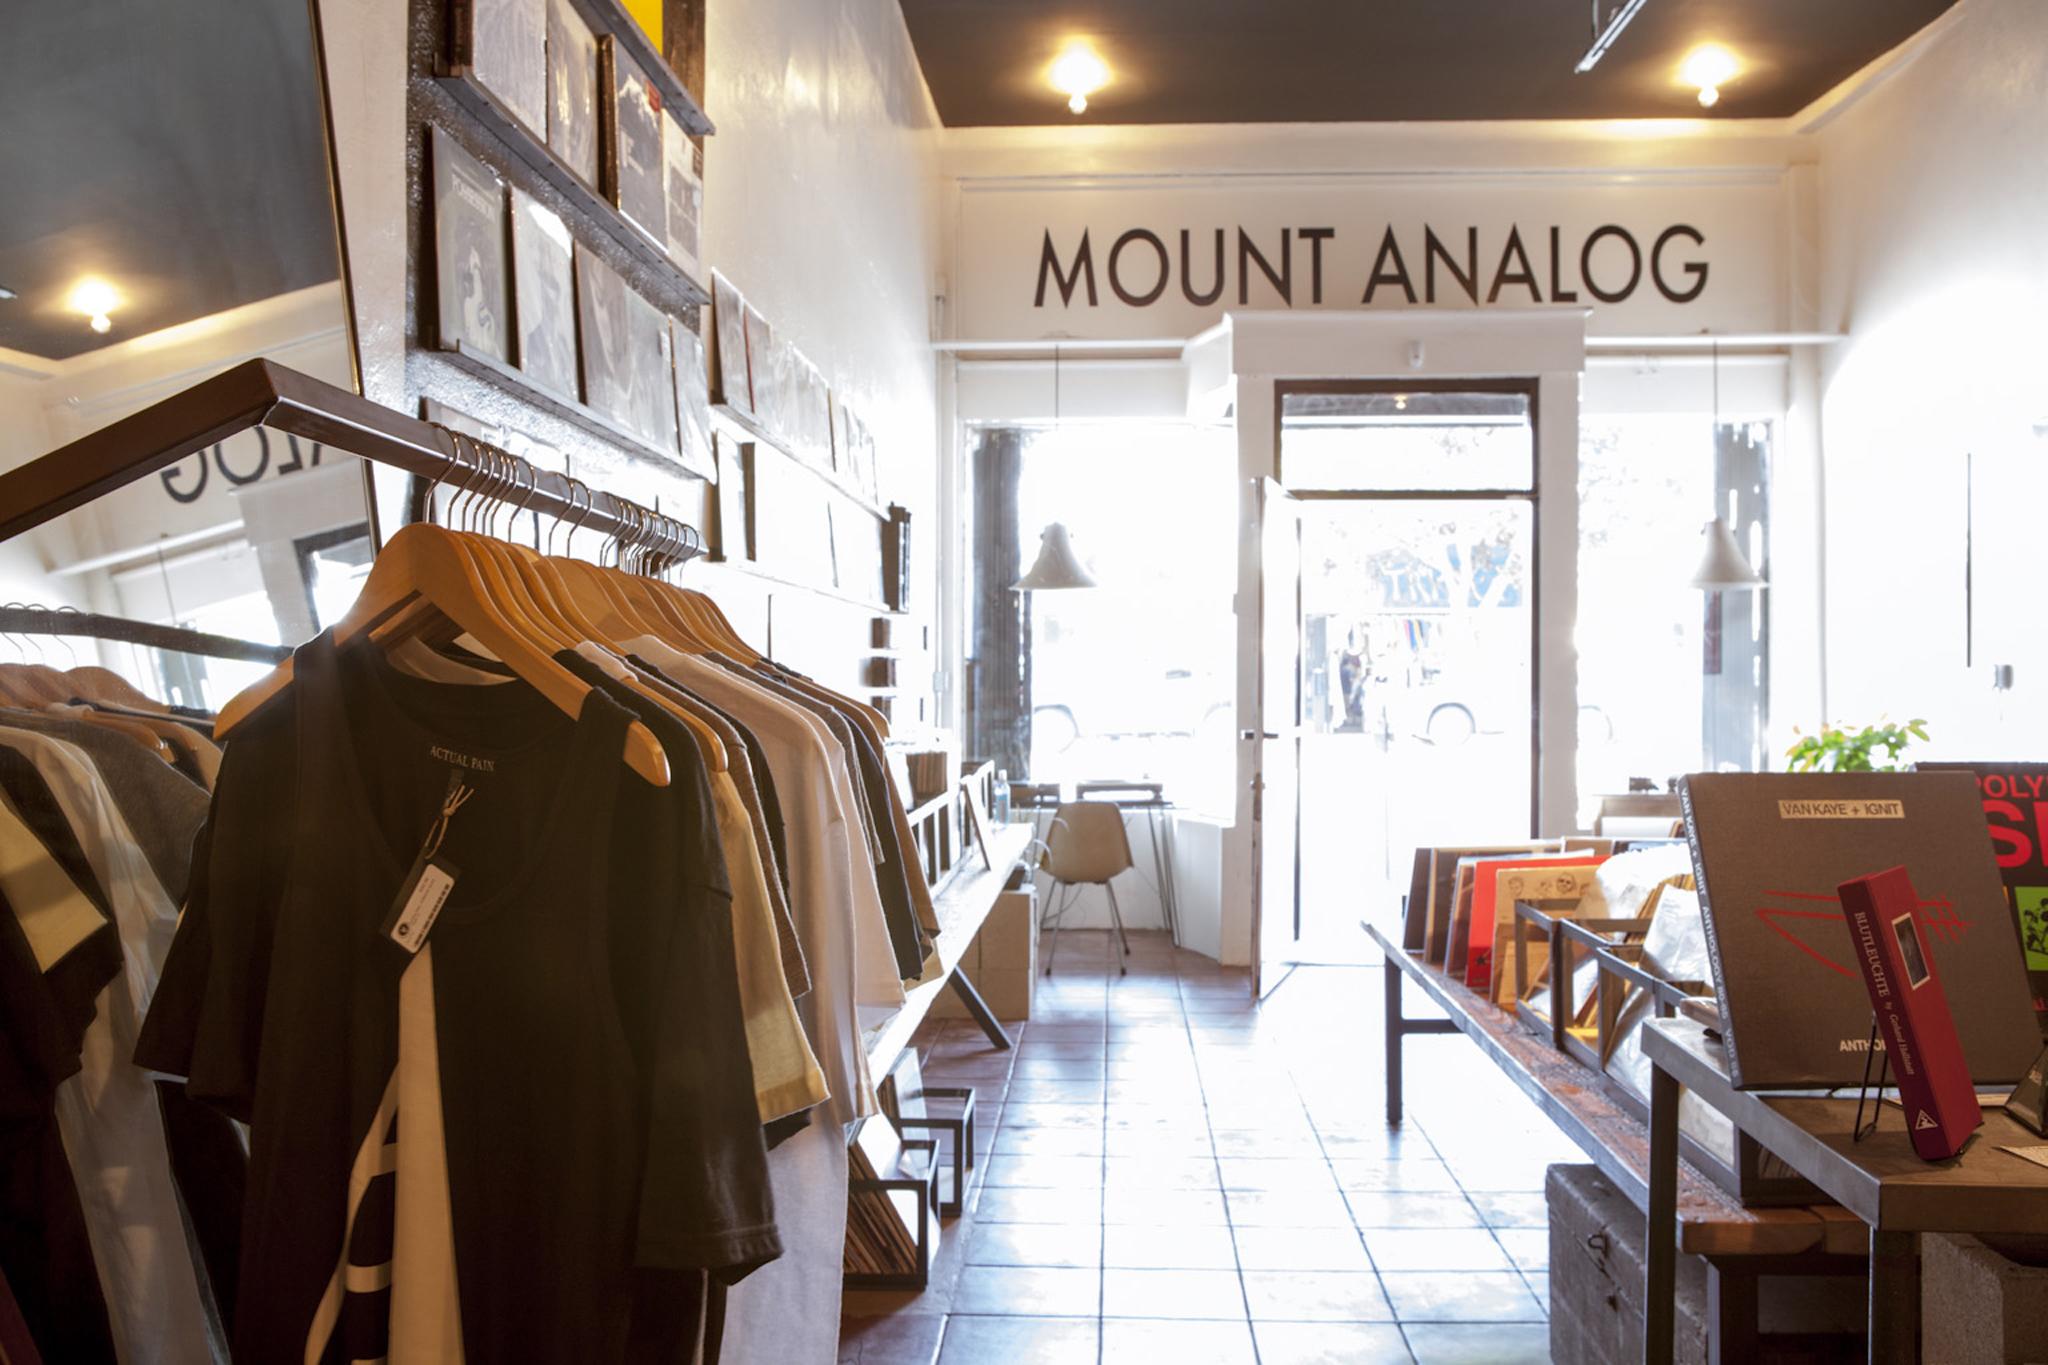 LA's most stylish shops